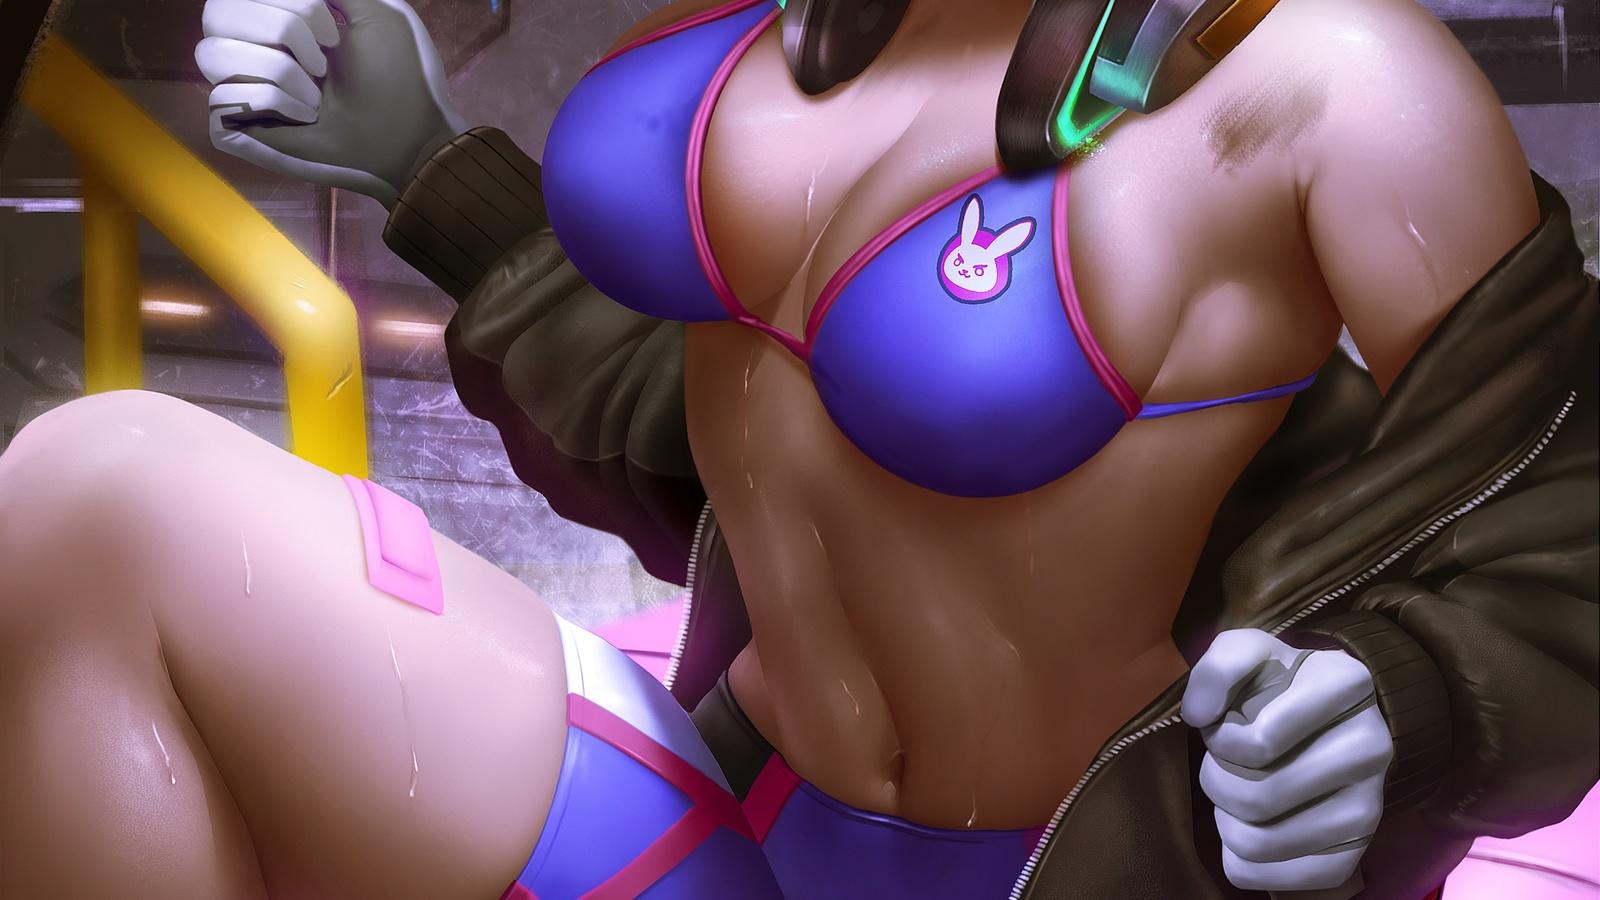 d.va, overwatch, game, boobs, girl, sexy, bra, tights, bindow, anime, window